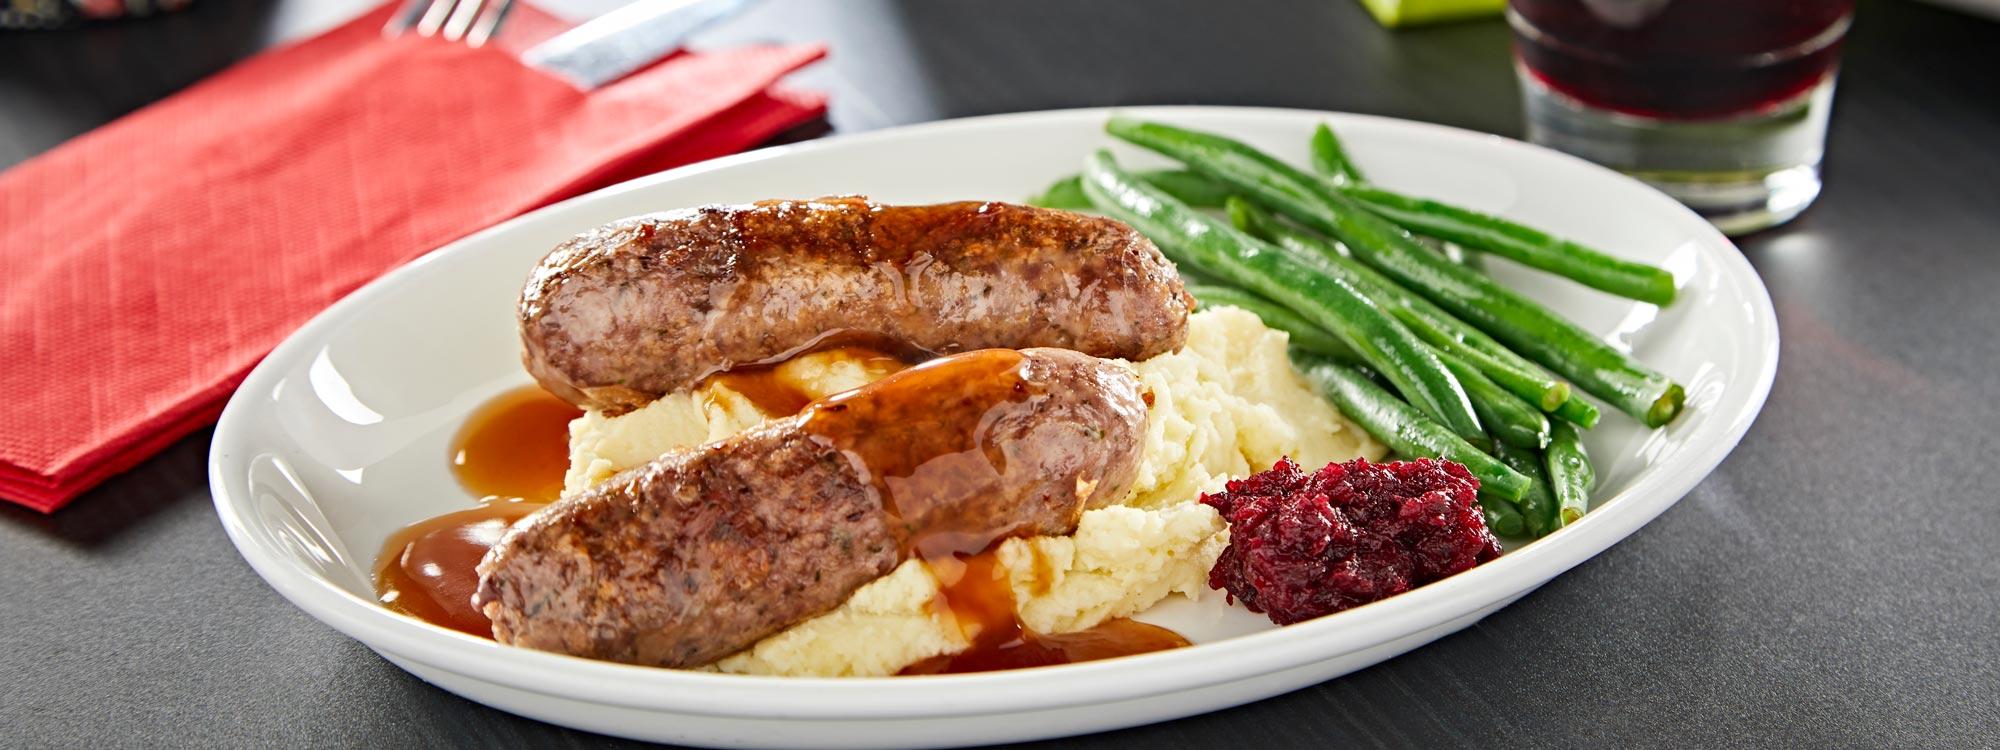 Venison sausages, mash and green beans LNER First Class Menu